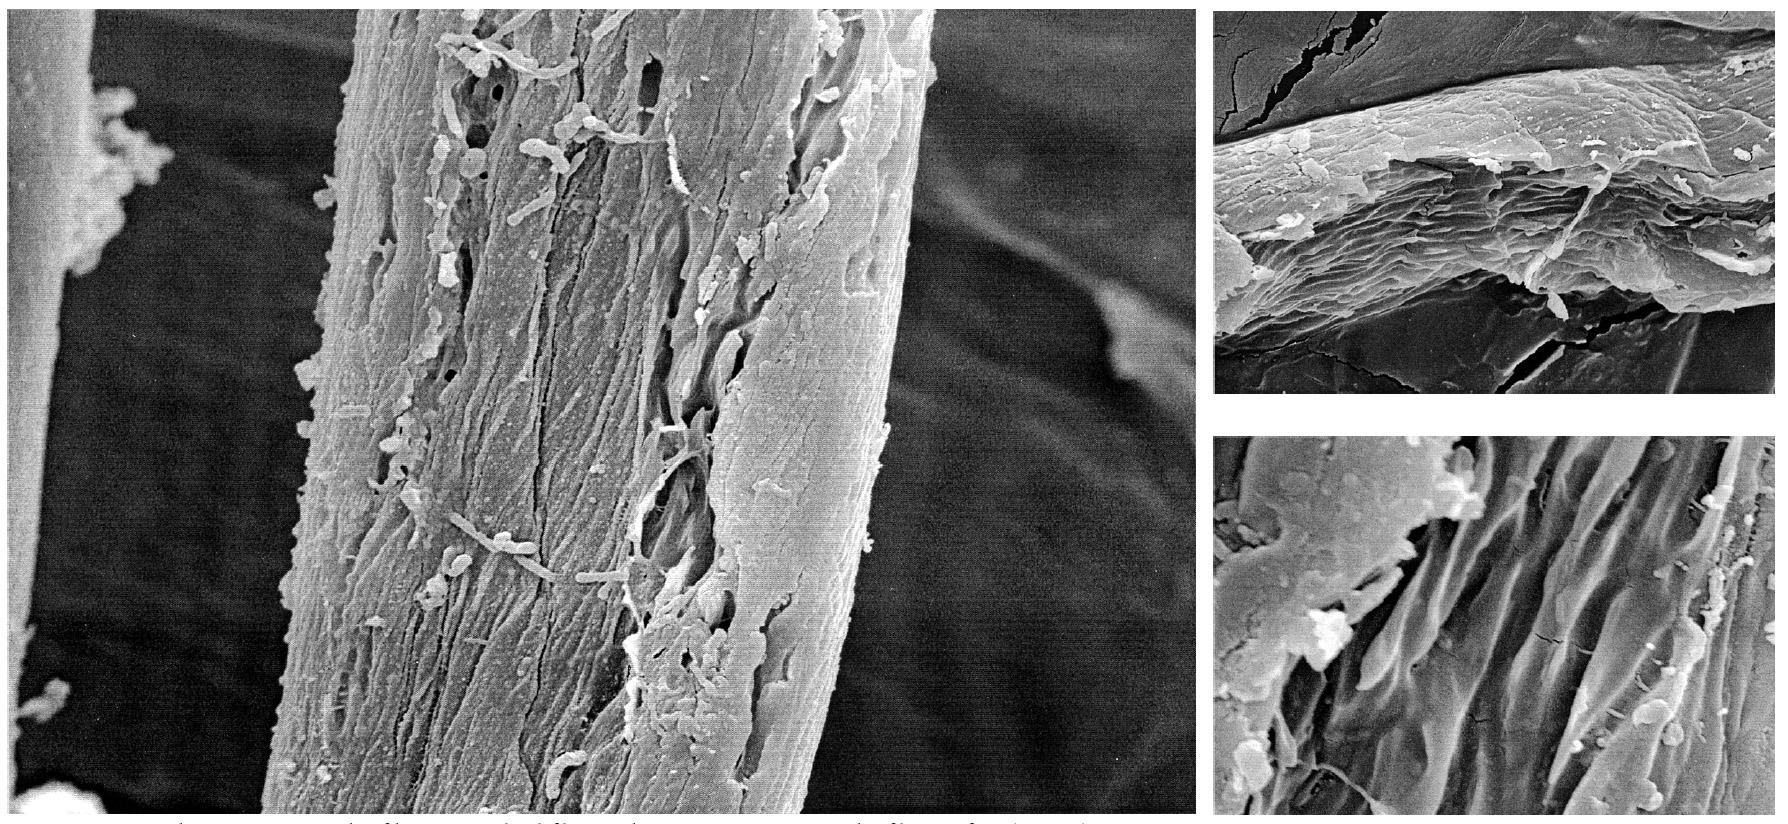 algodón al microscopio